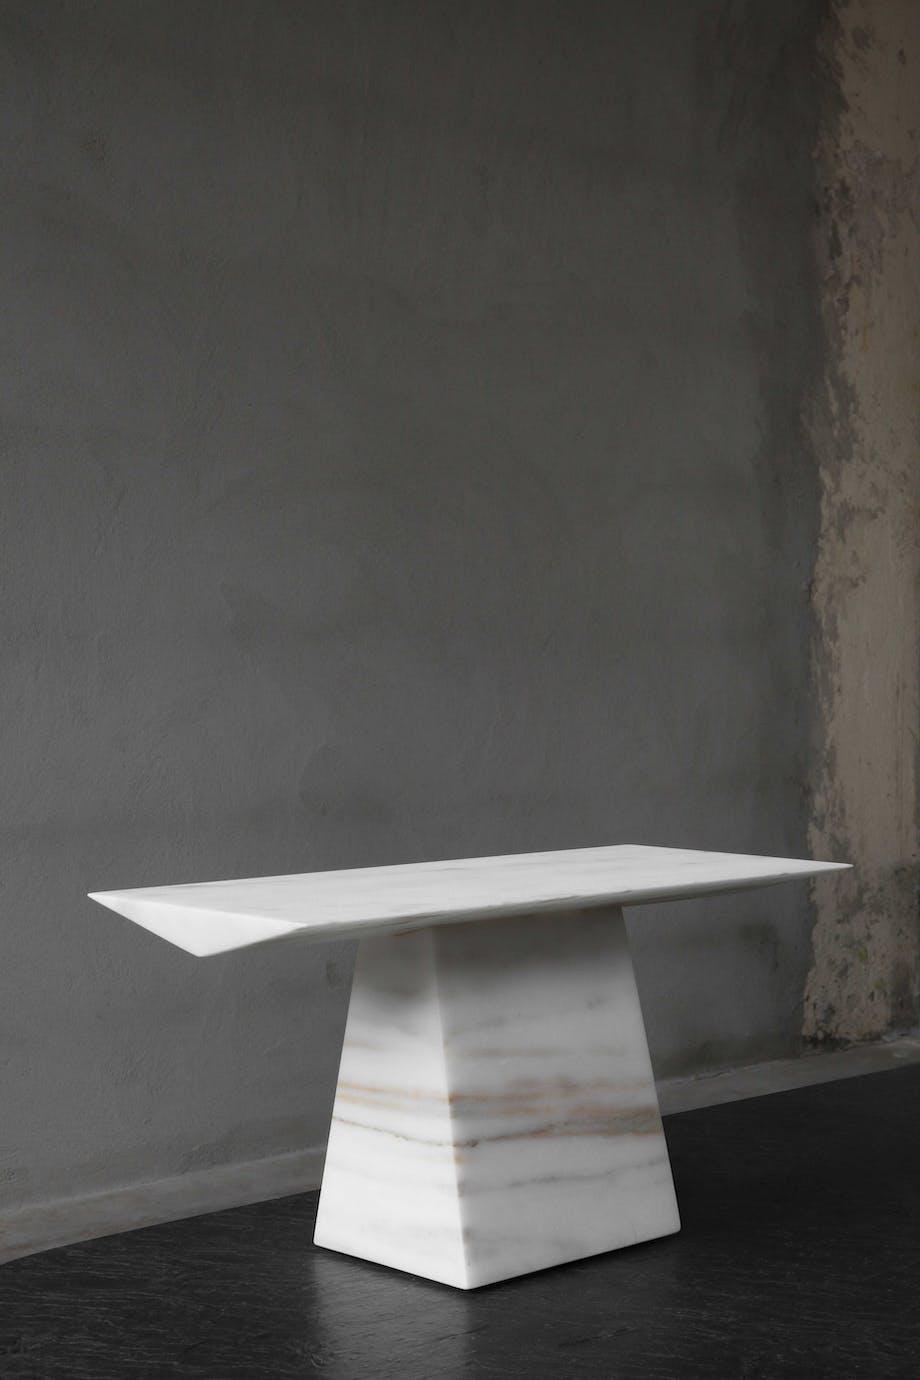 Tau av Lars Ernst Hole